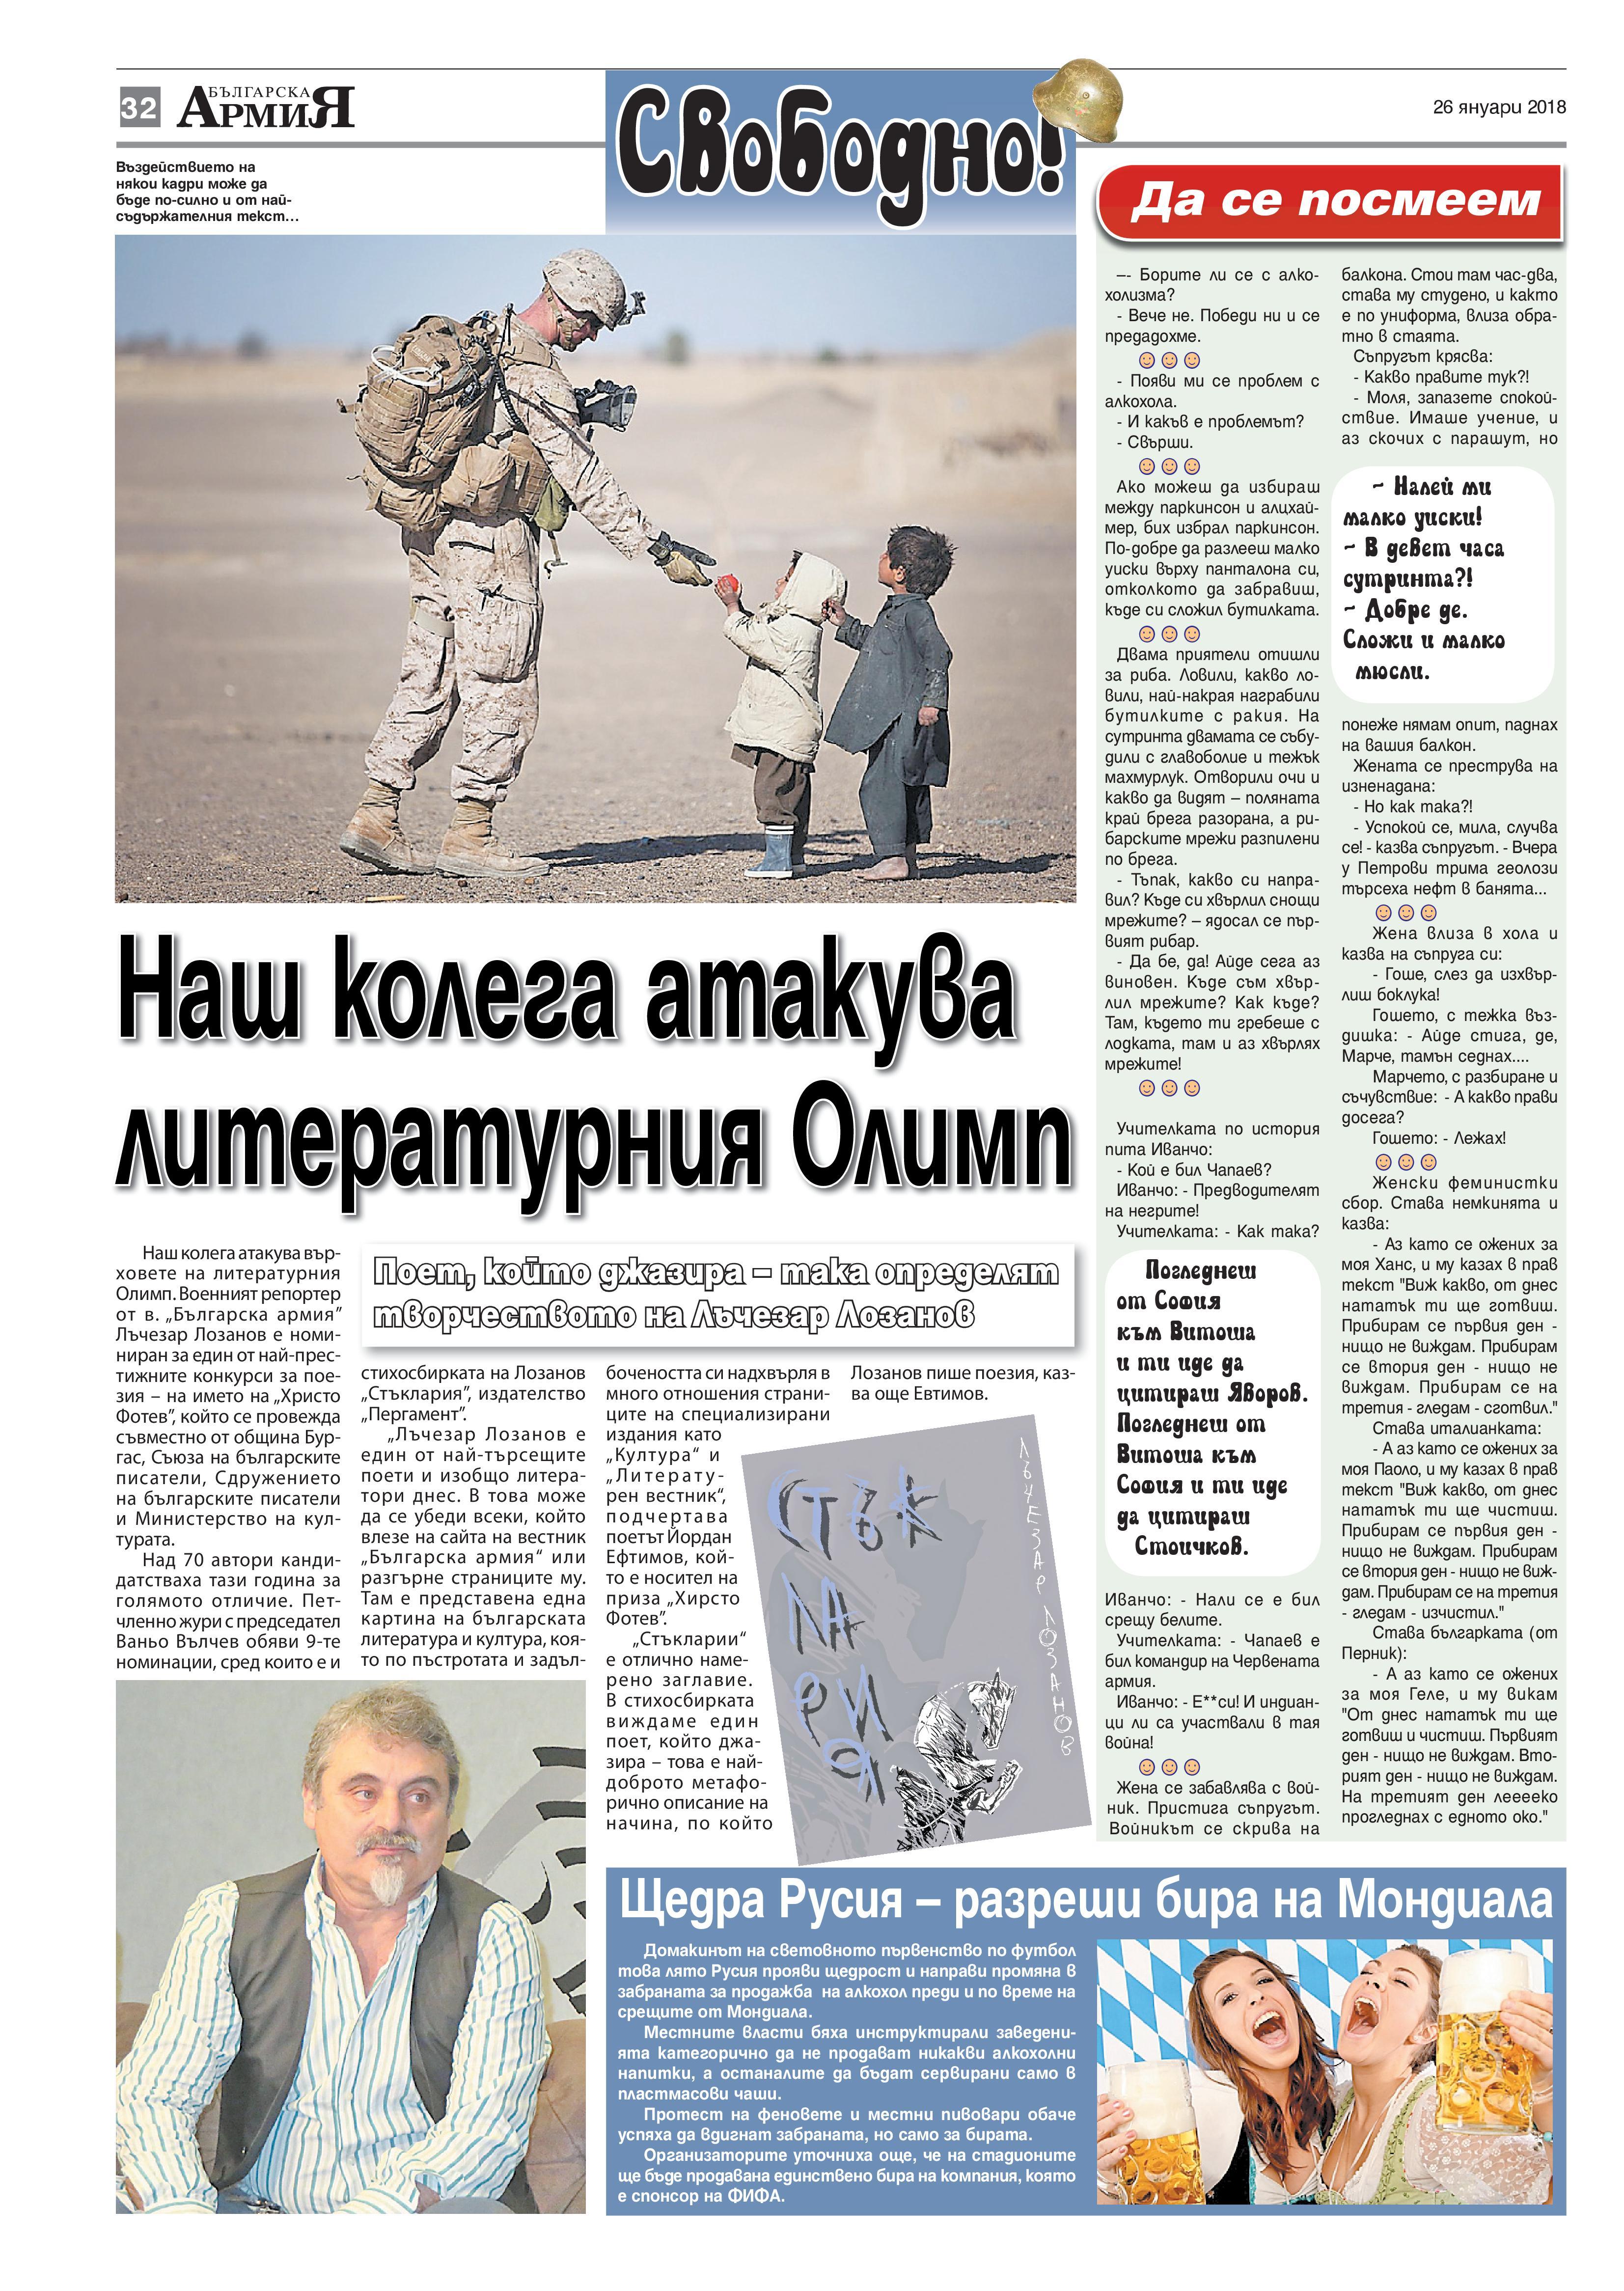 https://armymedia.bg/wp-content/uploads/2015/06/32-17.jpg